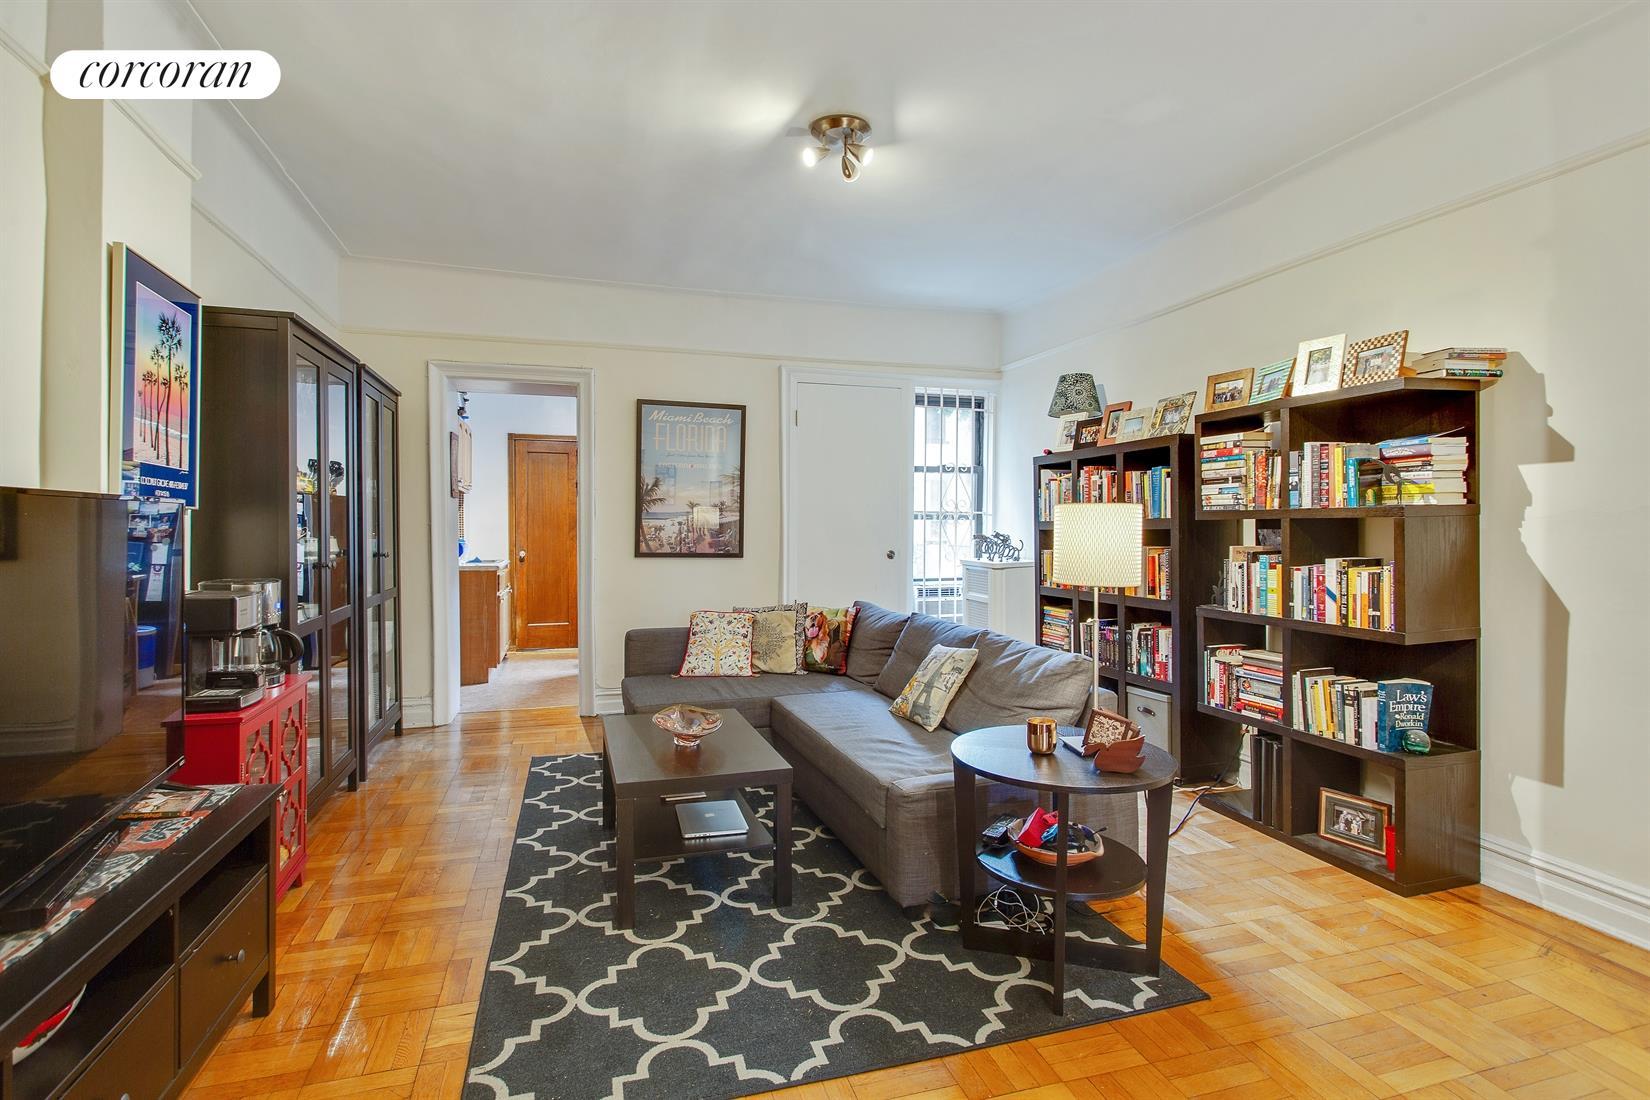 Corcoran, 133 7TH AVE, Apt. 2, Park Slope Rentals, Brooklyn Rentals ...